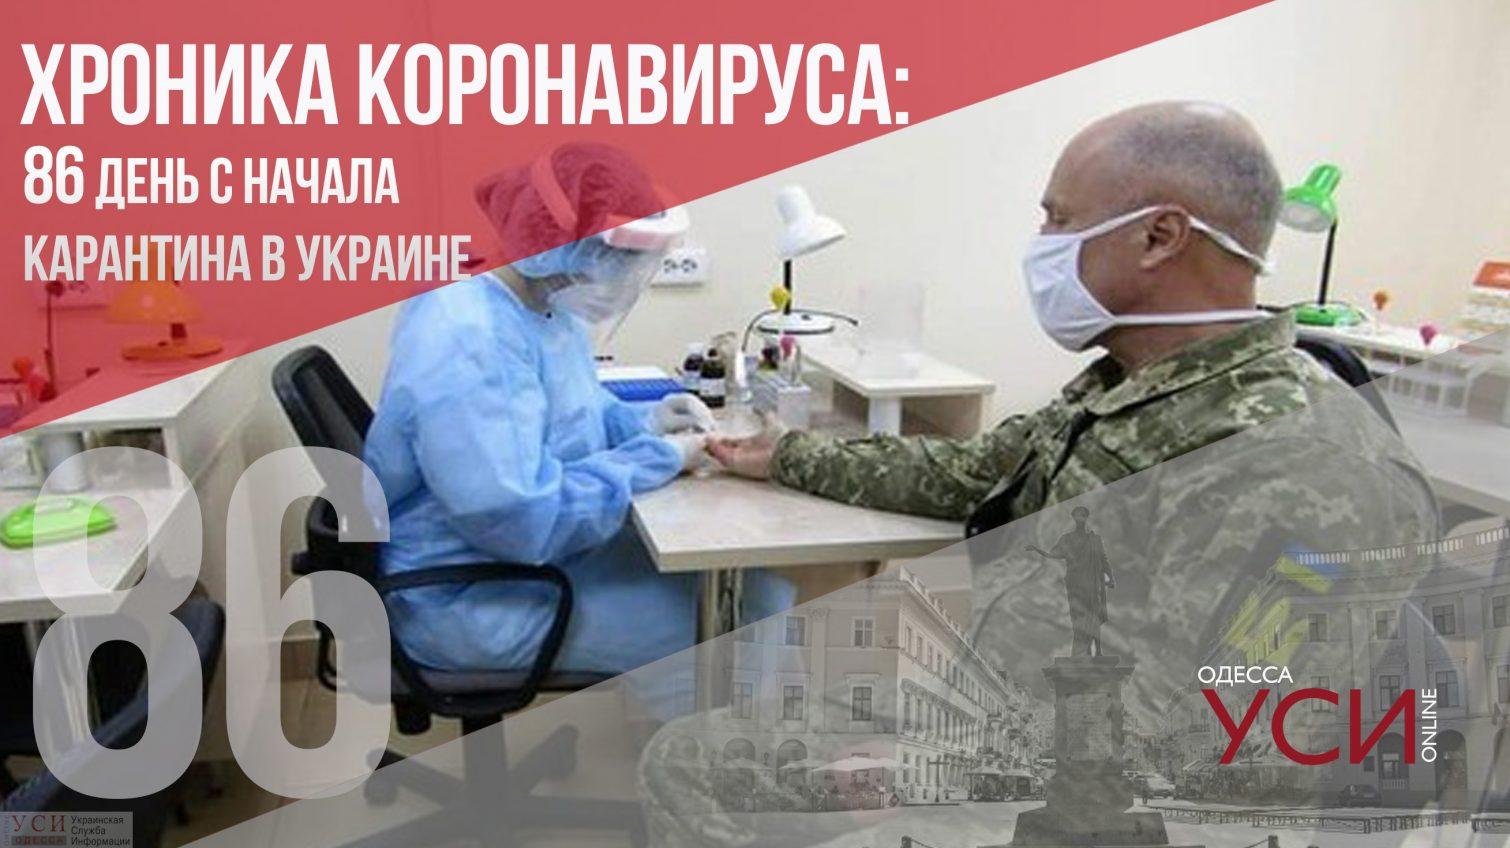 Хроника коронавируса: на 86 день карантина зафиксировали более 500 заболевших «фото»